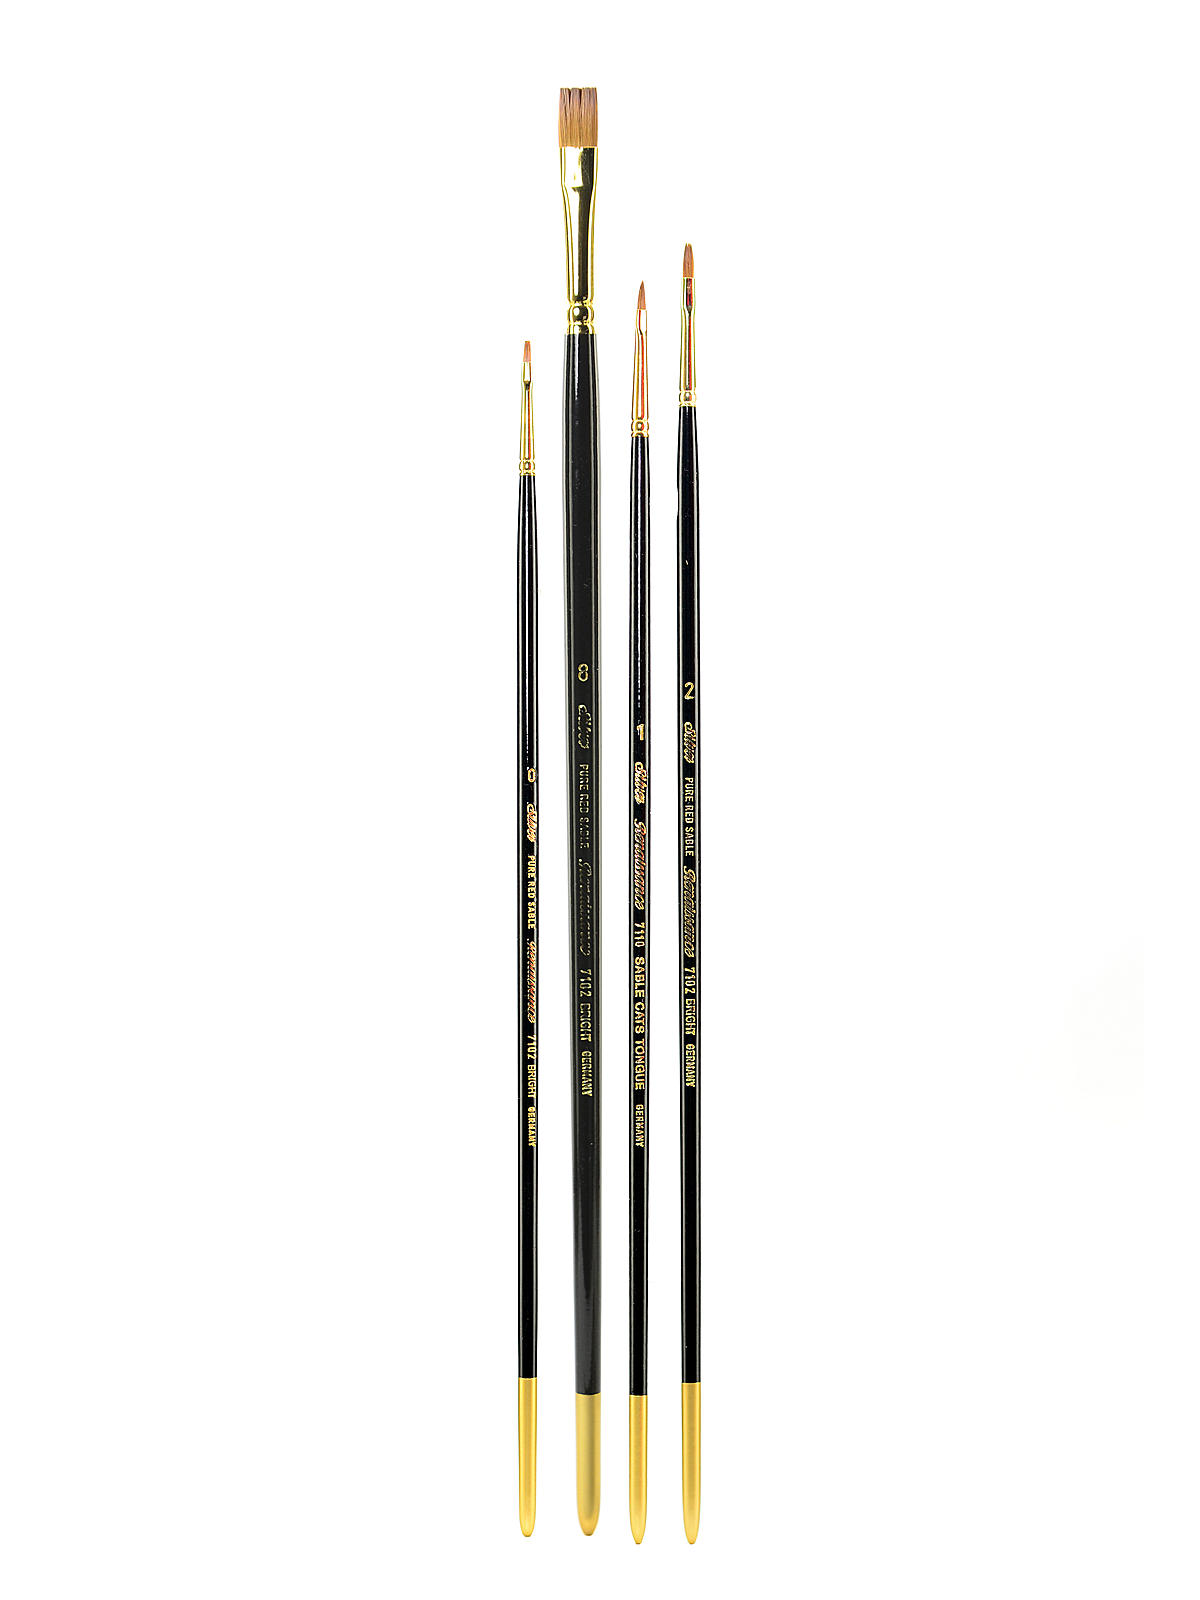 Renaissance Series Brushes Long Handle